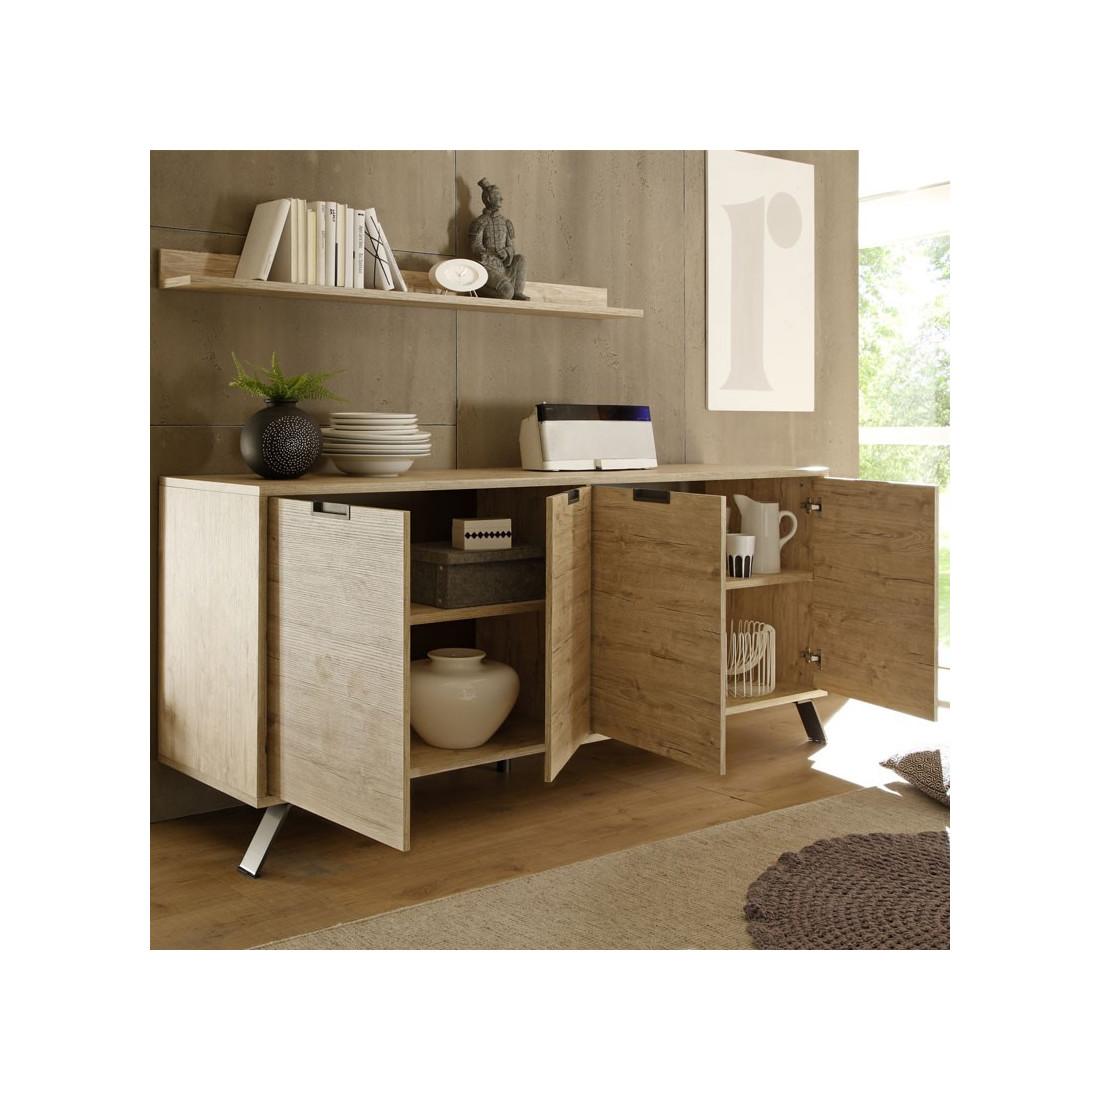 grand buffet 4 portes ch ne clair palerme univers salle manger. Black Bedroom Furniture Sets. Home Design Ideas